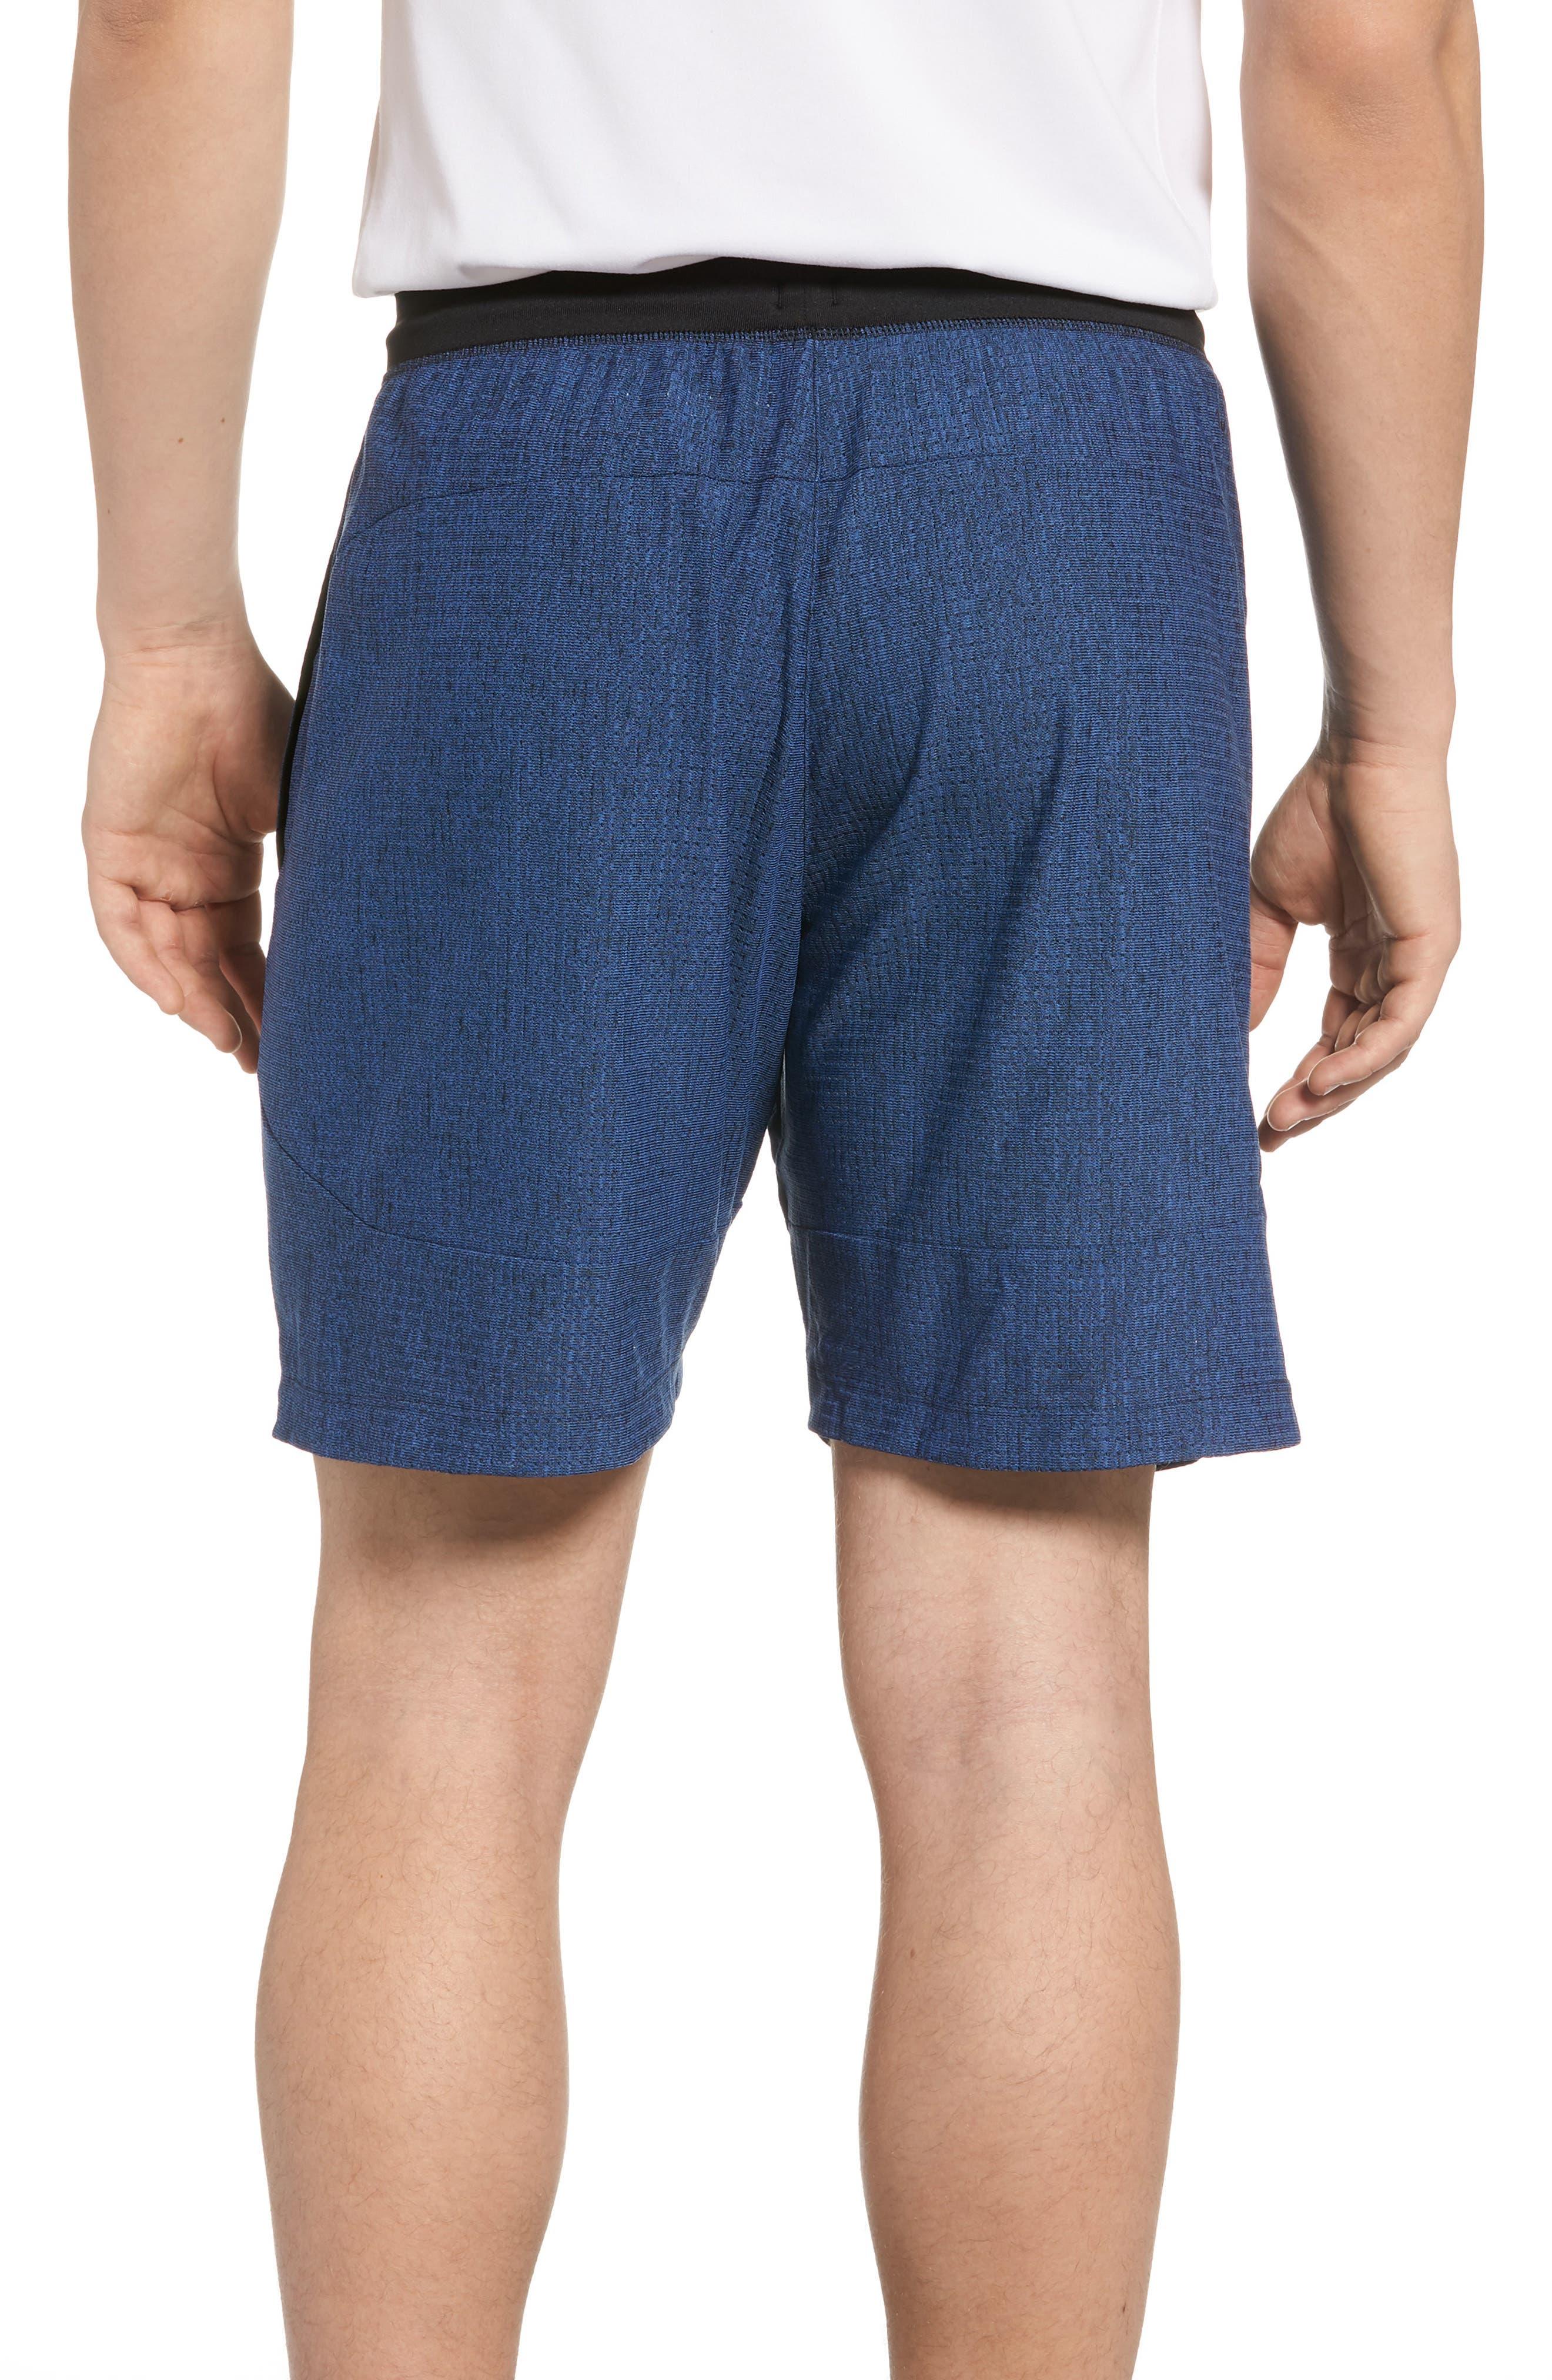 Speedbreaker Shorts,                             Alternate thumbnail 2, color,                             Hi-Res Blue